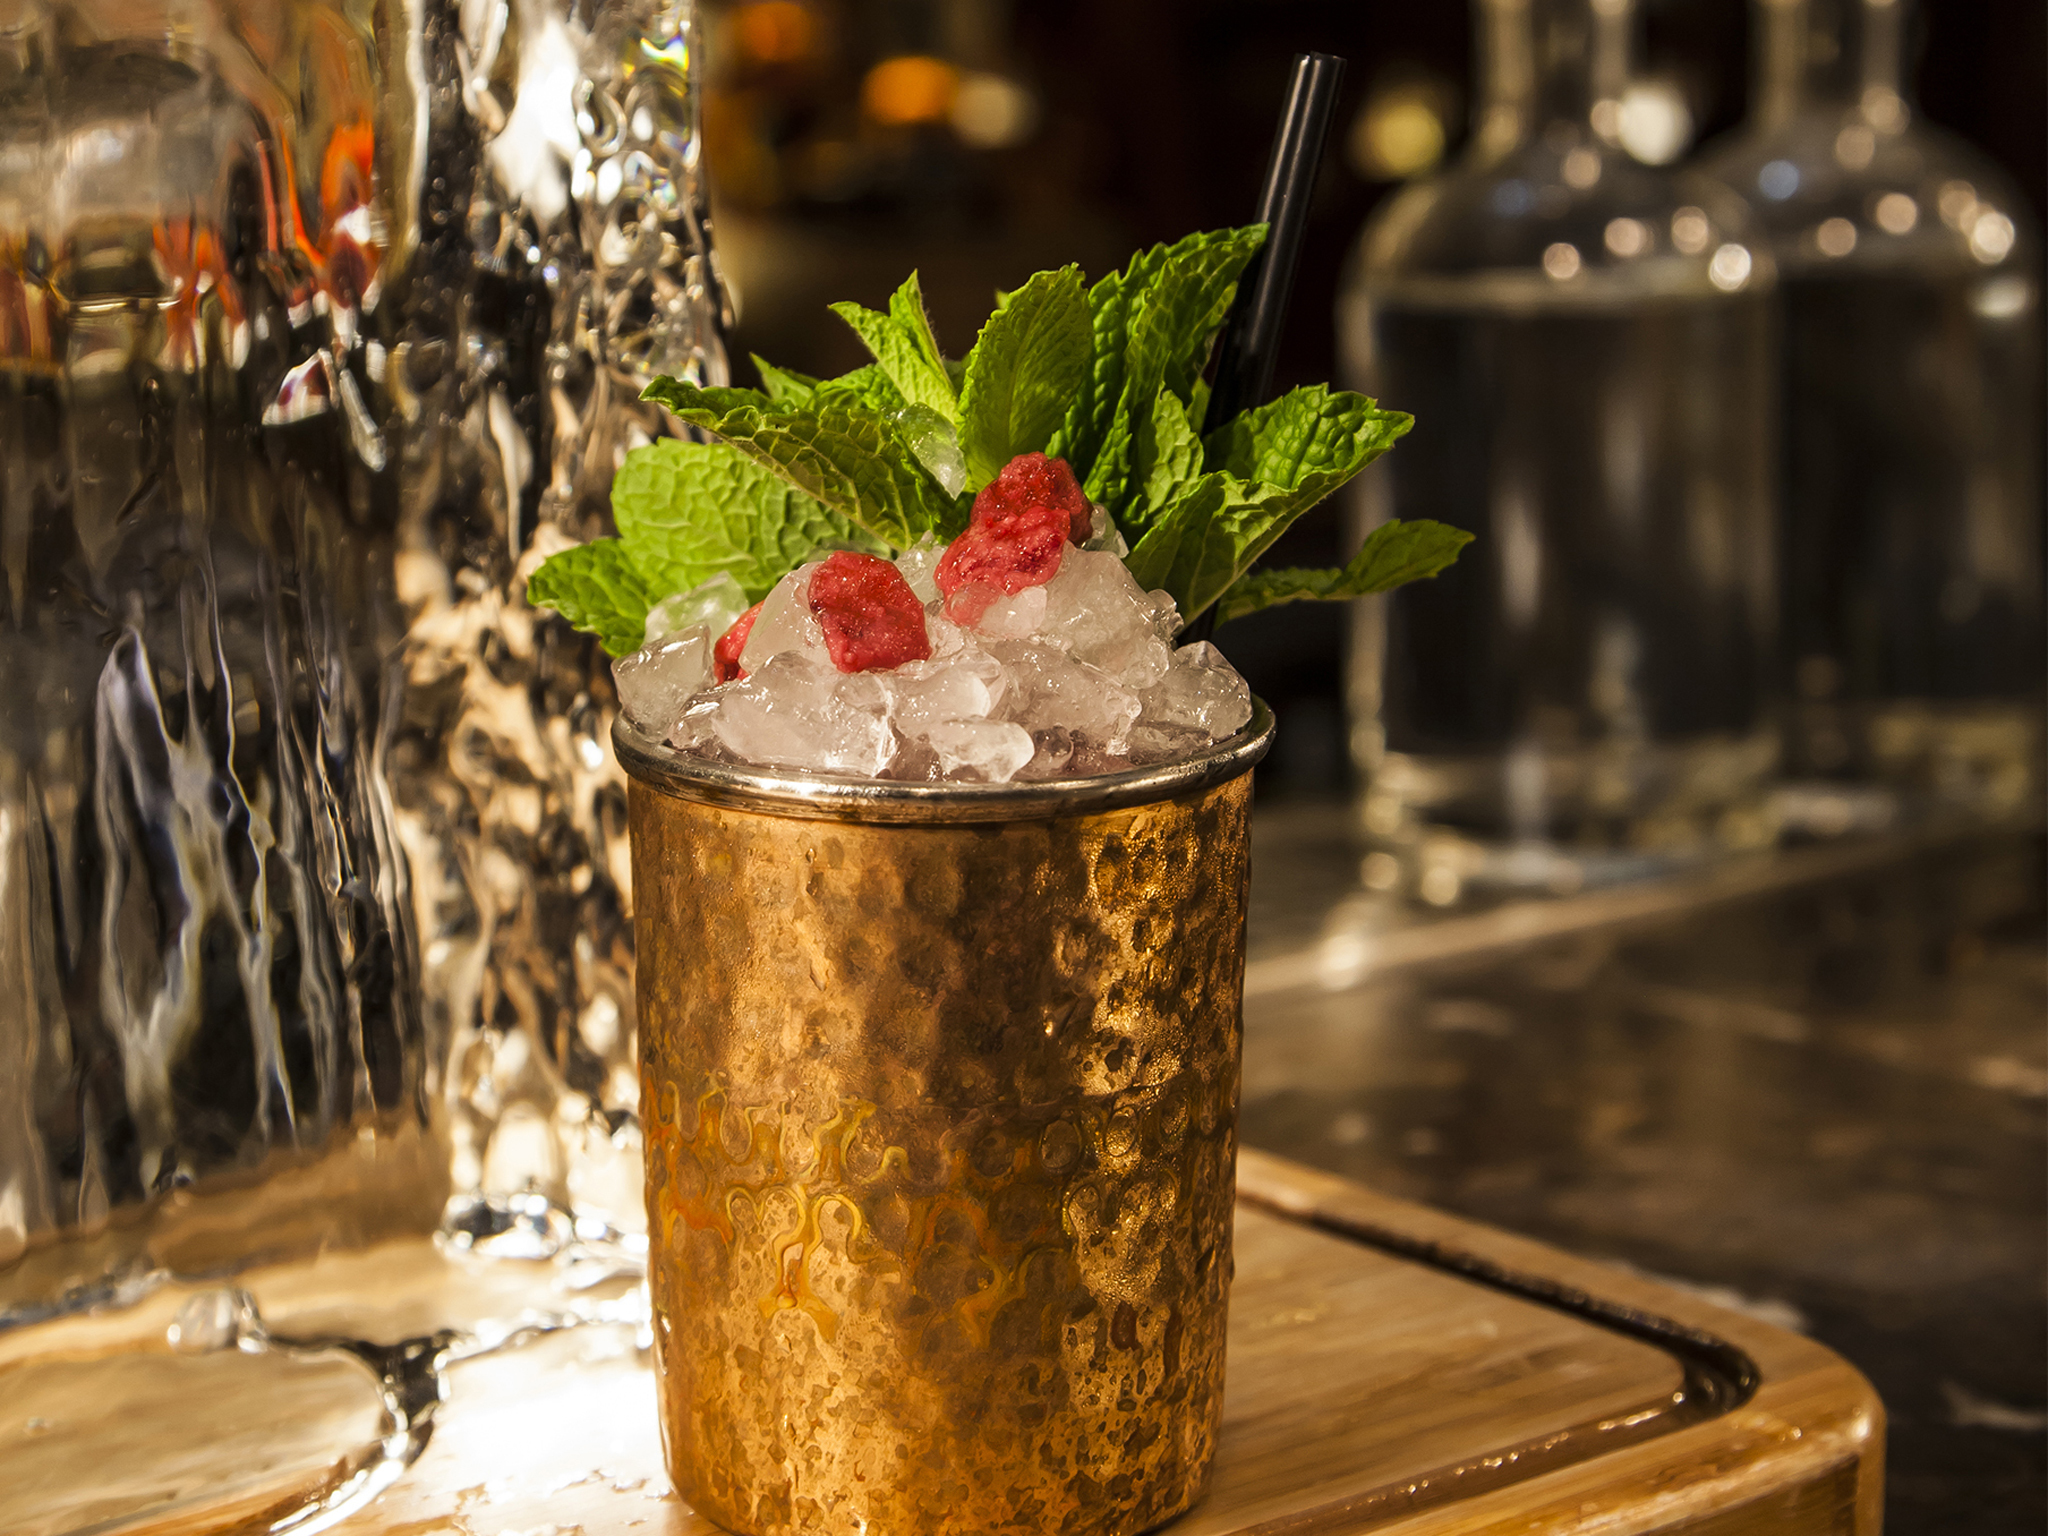 London's signature cocktails, dishoom permit room, edwina's affair